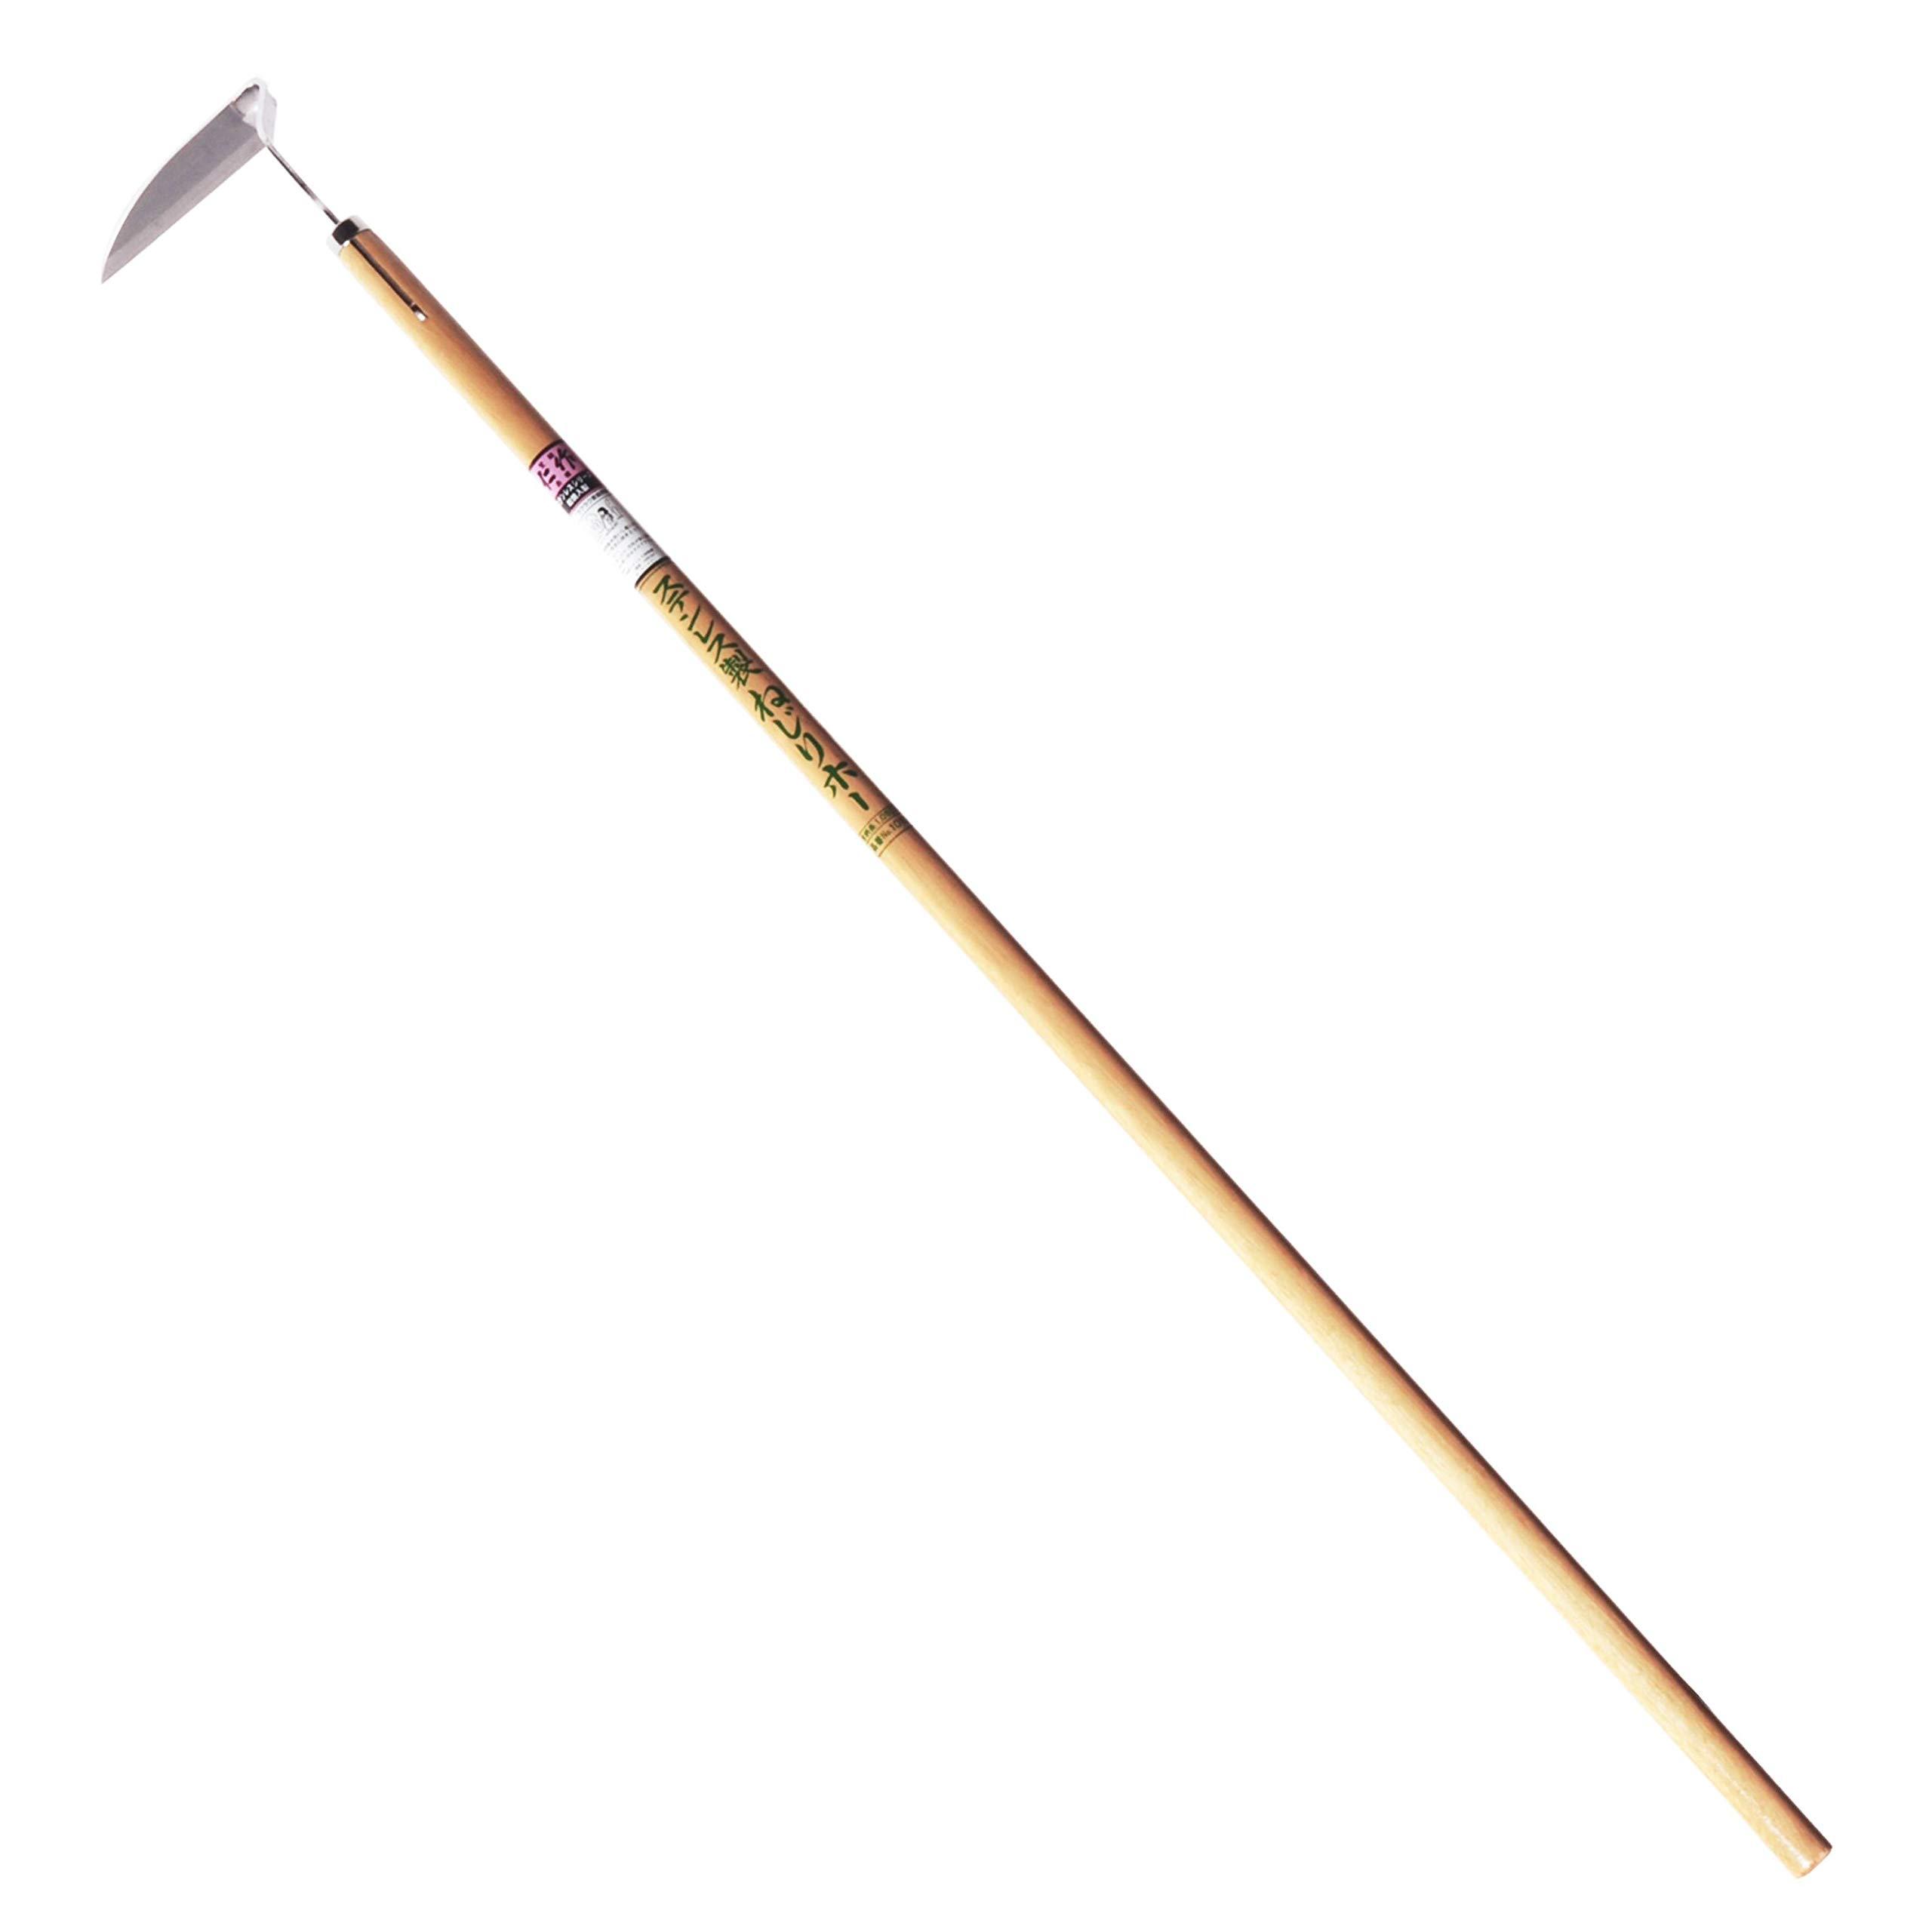 Nisaku NJP1010 Medium Length Nejiri Gama Sharpened Weeding Hoe, Authentic Tomita (Est. 1960) Japanese Stainless Steel, 4.5'' Blade Width, Polished 45'' Wood Handle